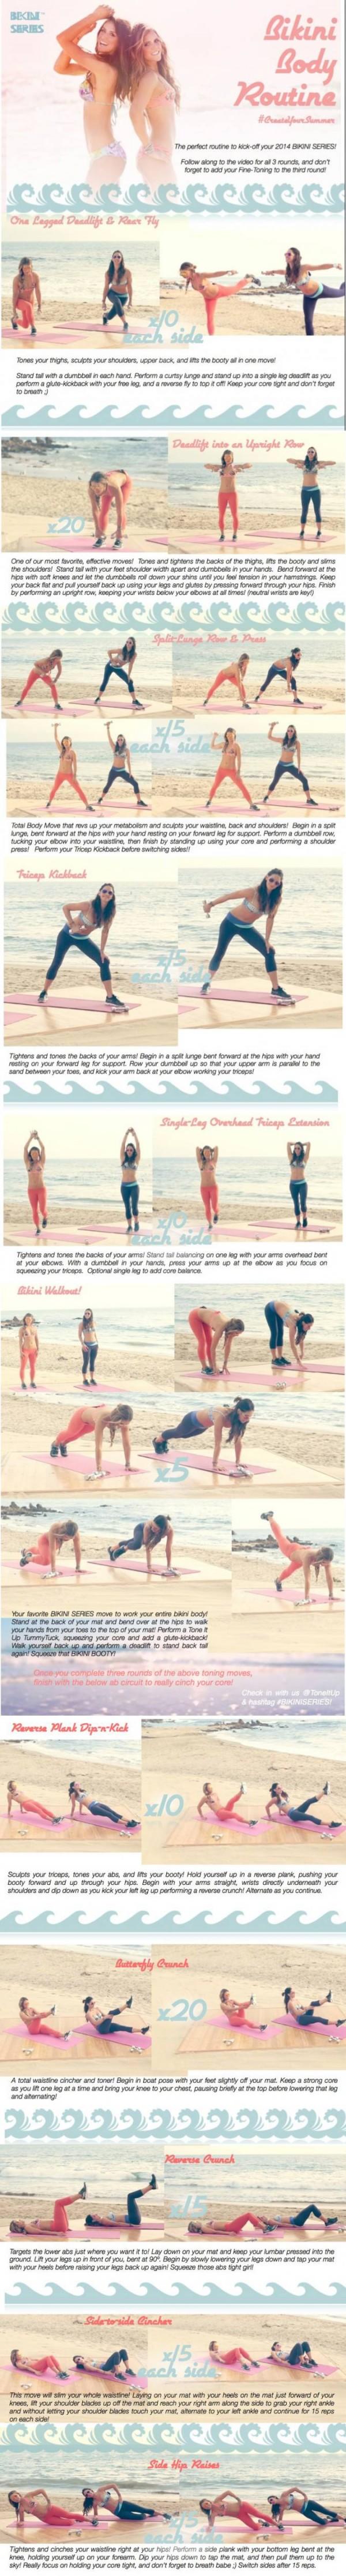 TIU Bikini Body Workout